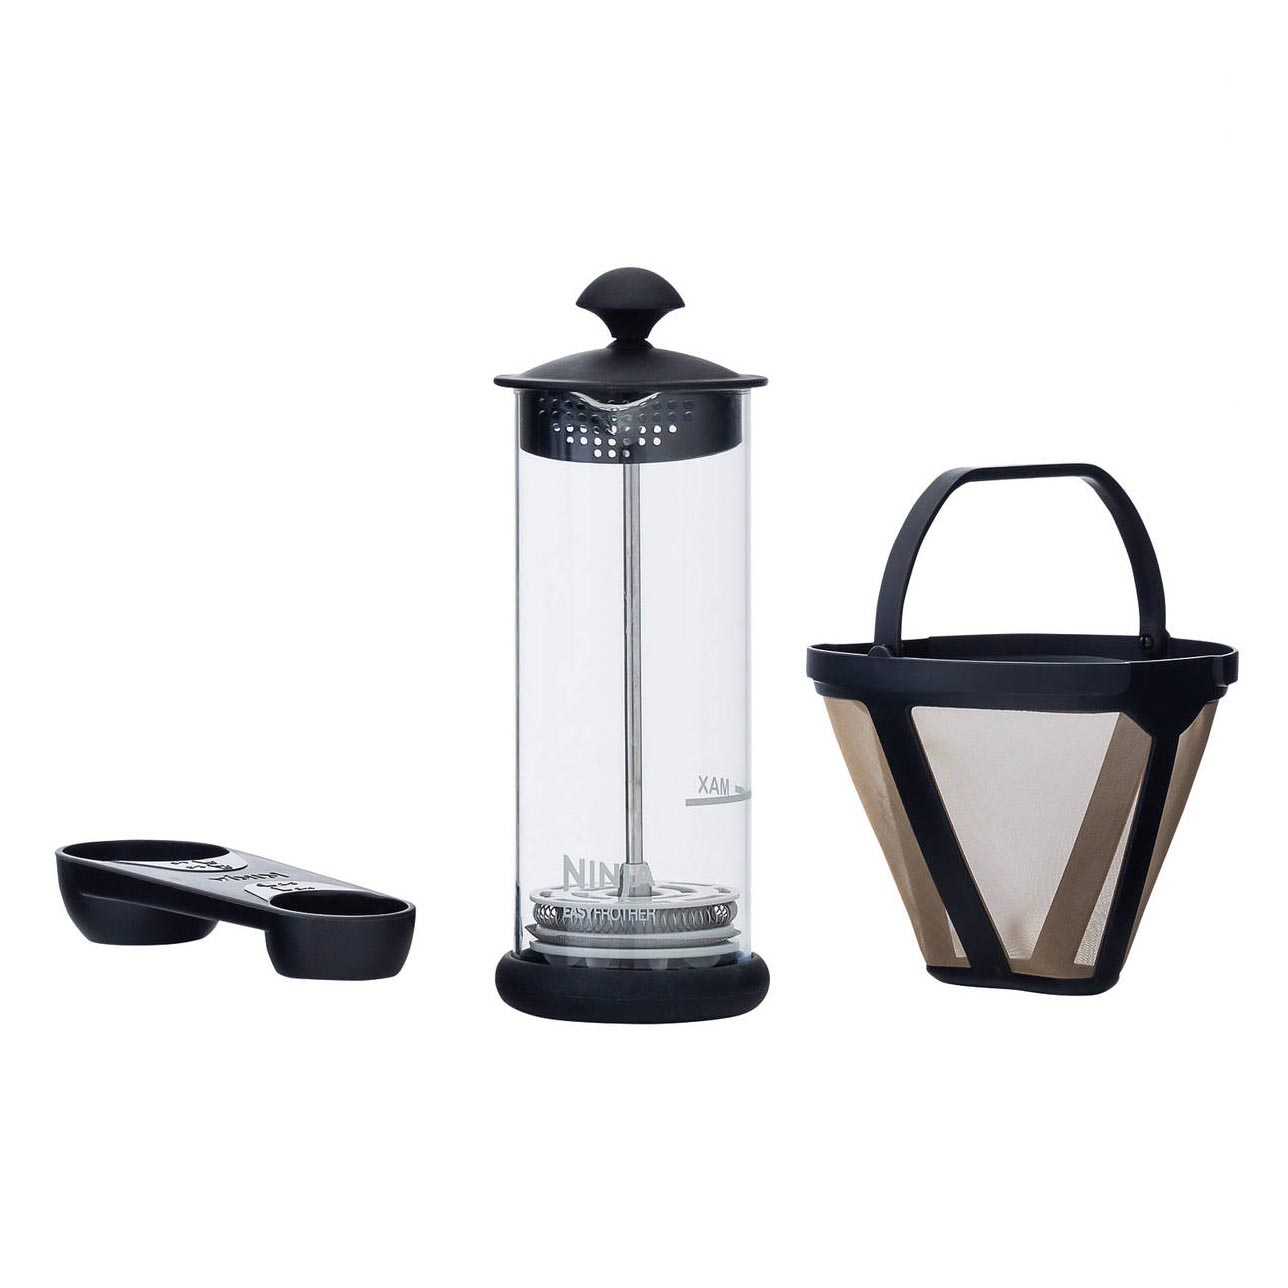 Ninja Coffee Bar with Glass Carafe and Auto-IQ 1 Touch Intelligence CF080W eBay